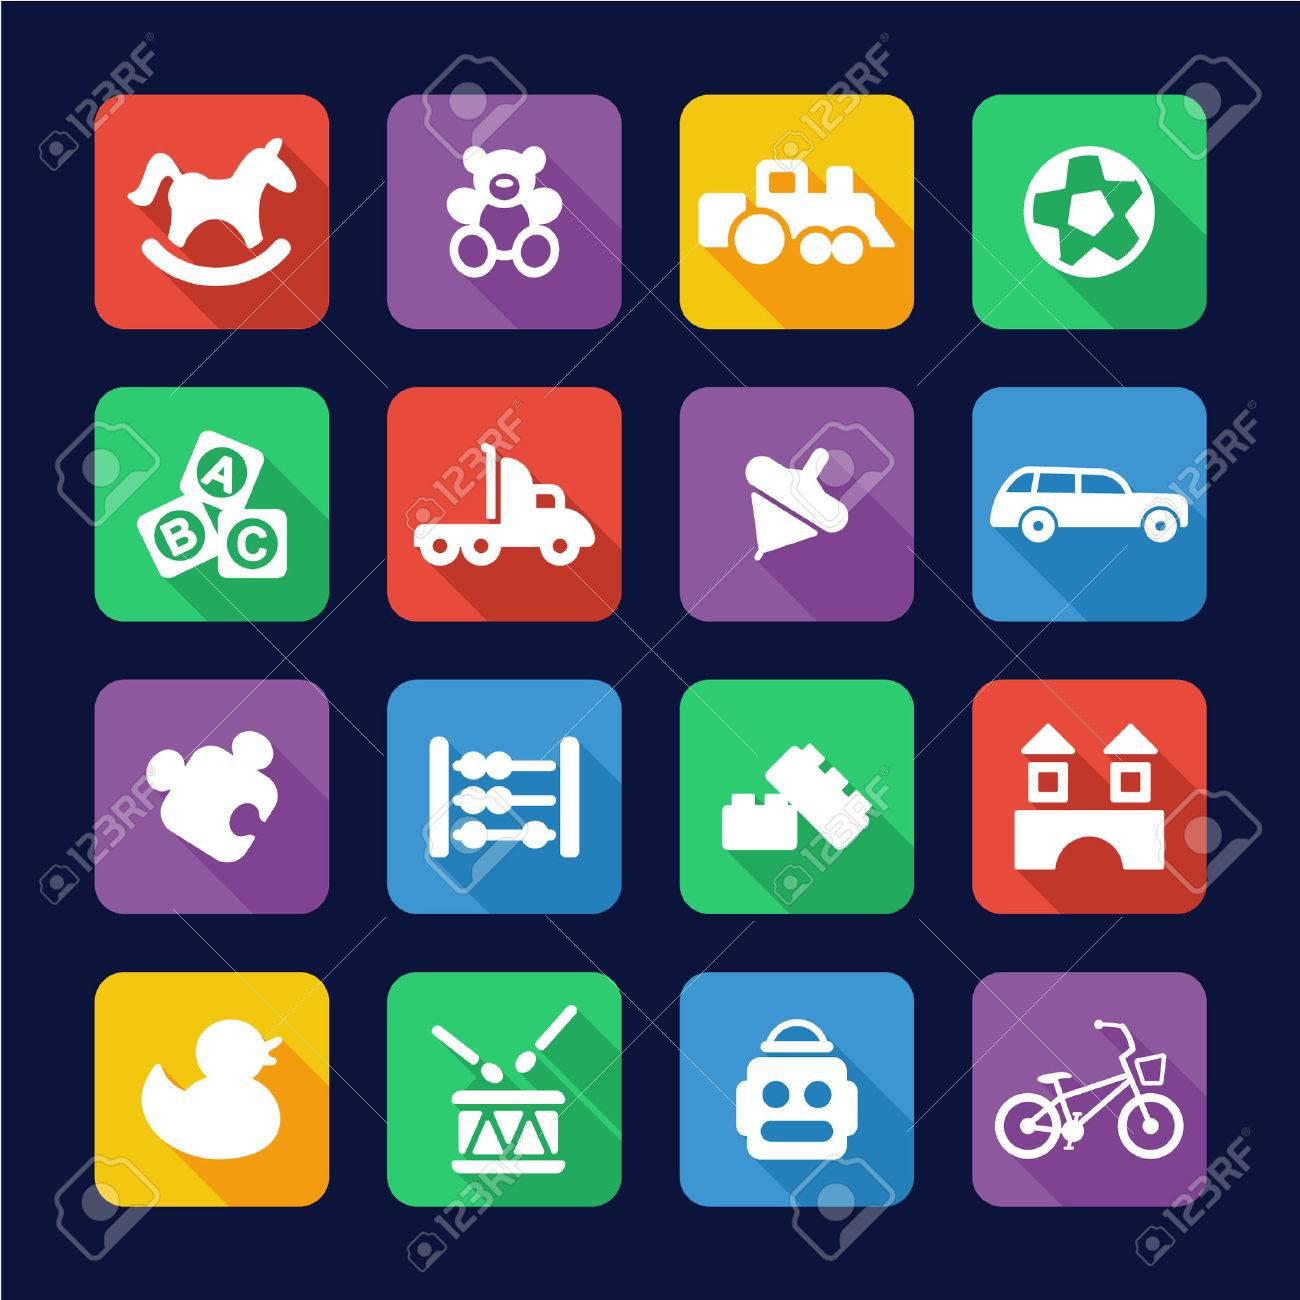 Toys Icons Flat Design - 47315432